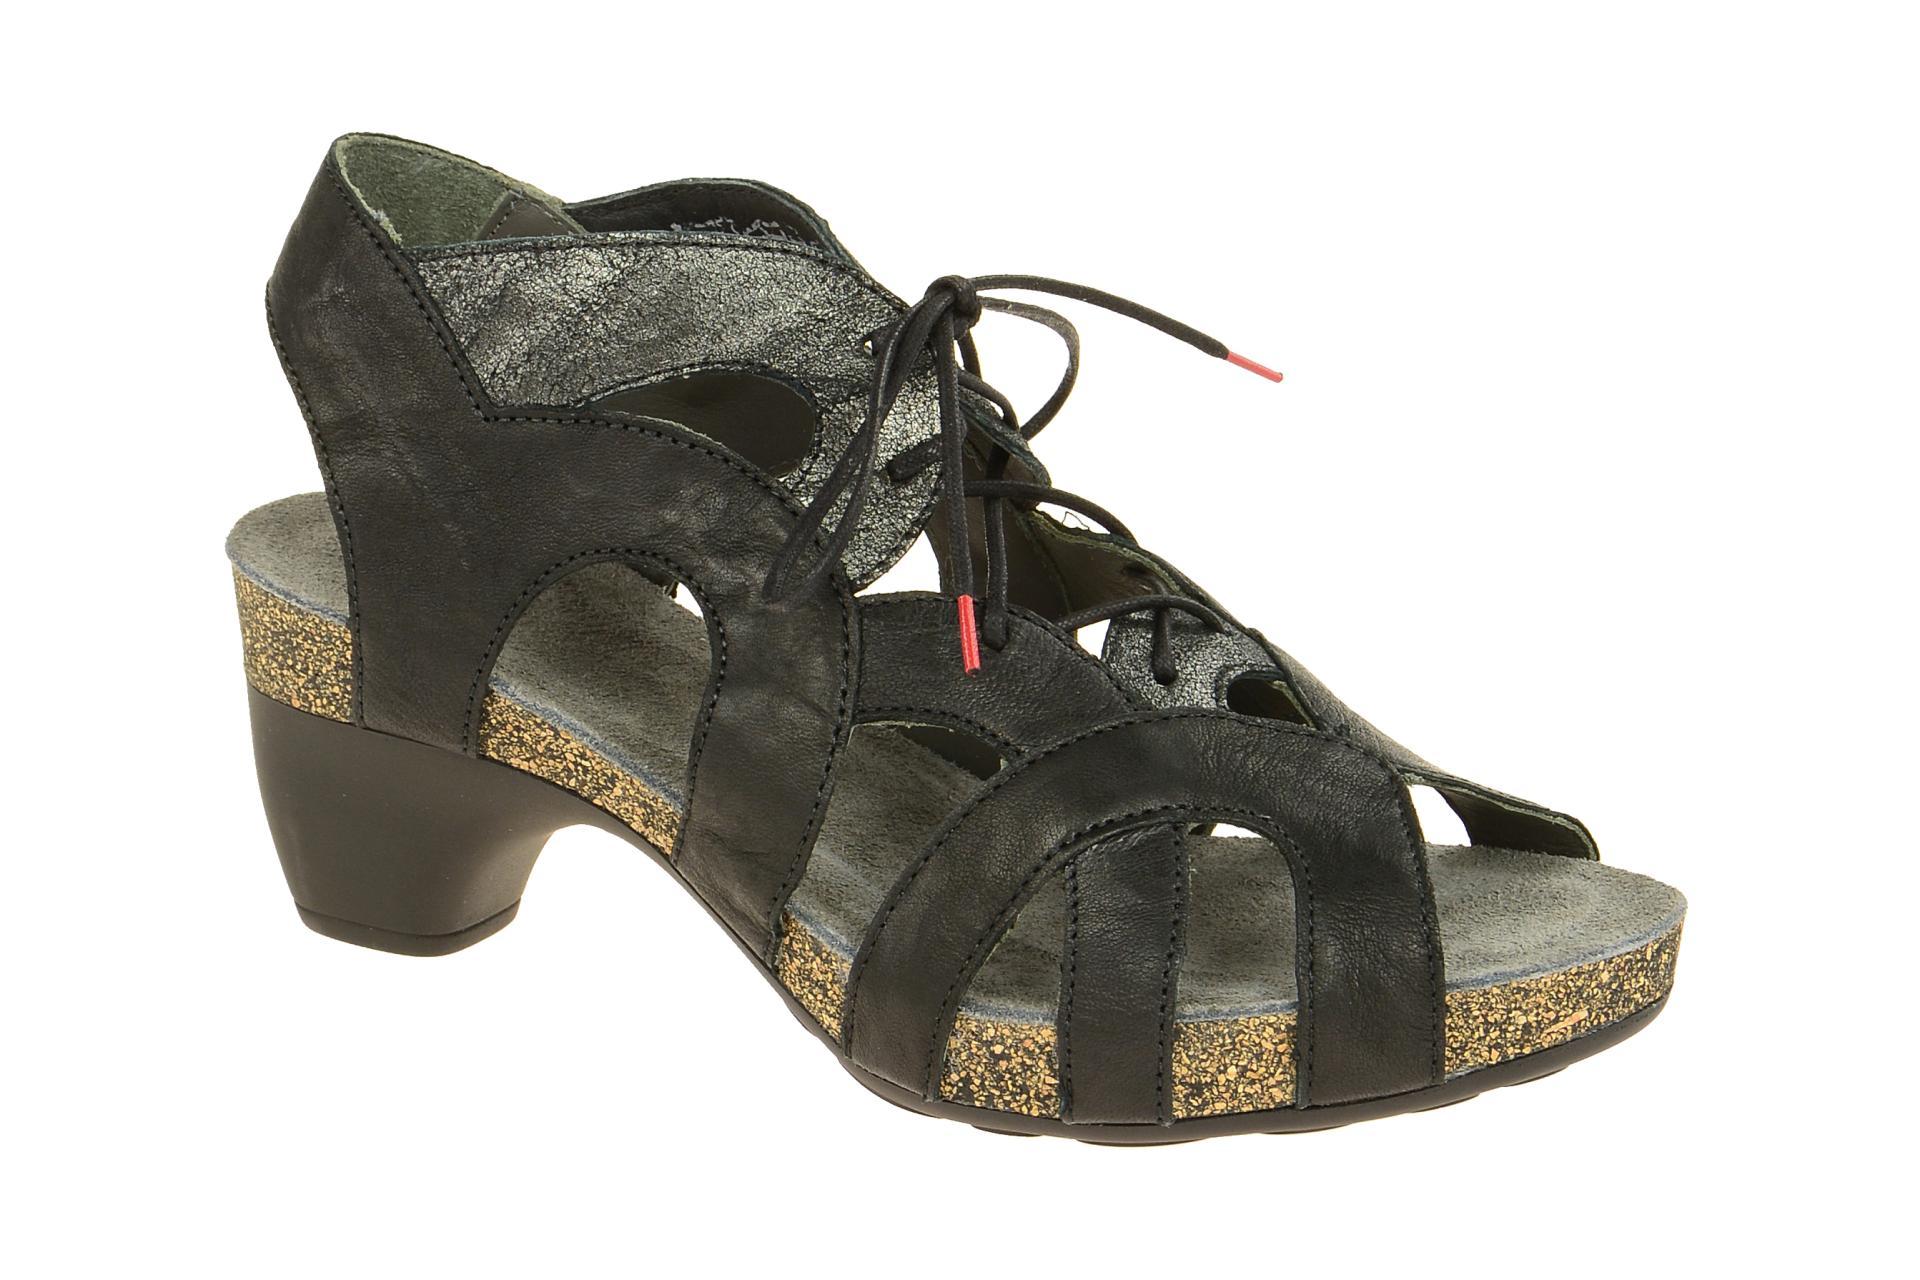 think schuhe traudi schwarz damen sandale sandaletten 2 82576 09 neu ebay. Black Bedroom Furniture Sets. Home Design Ideas